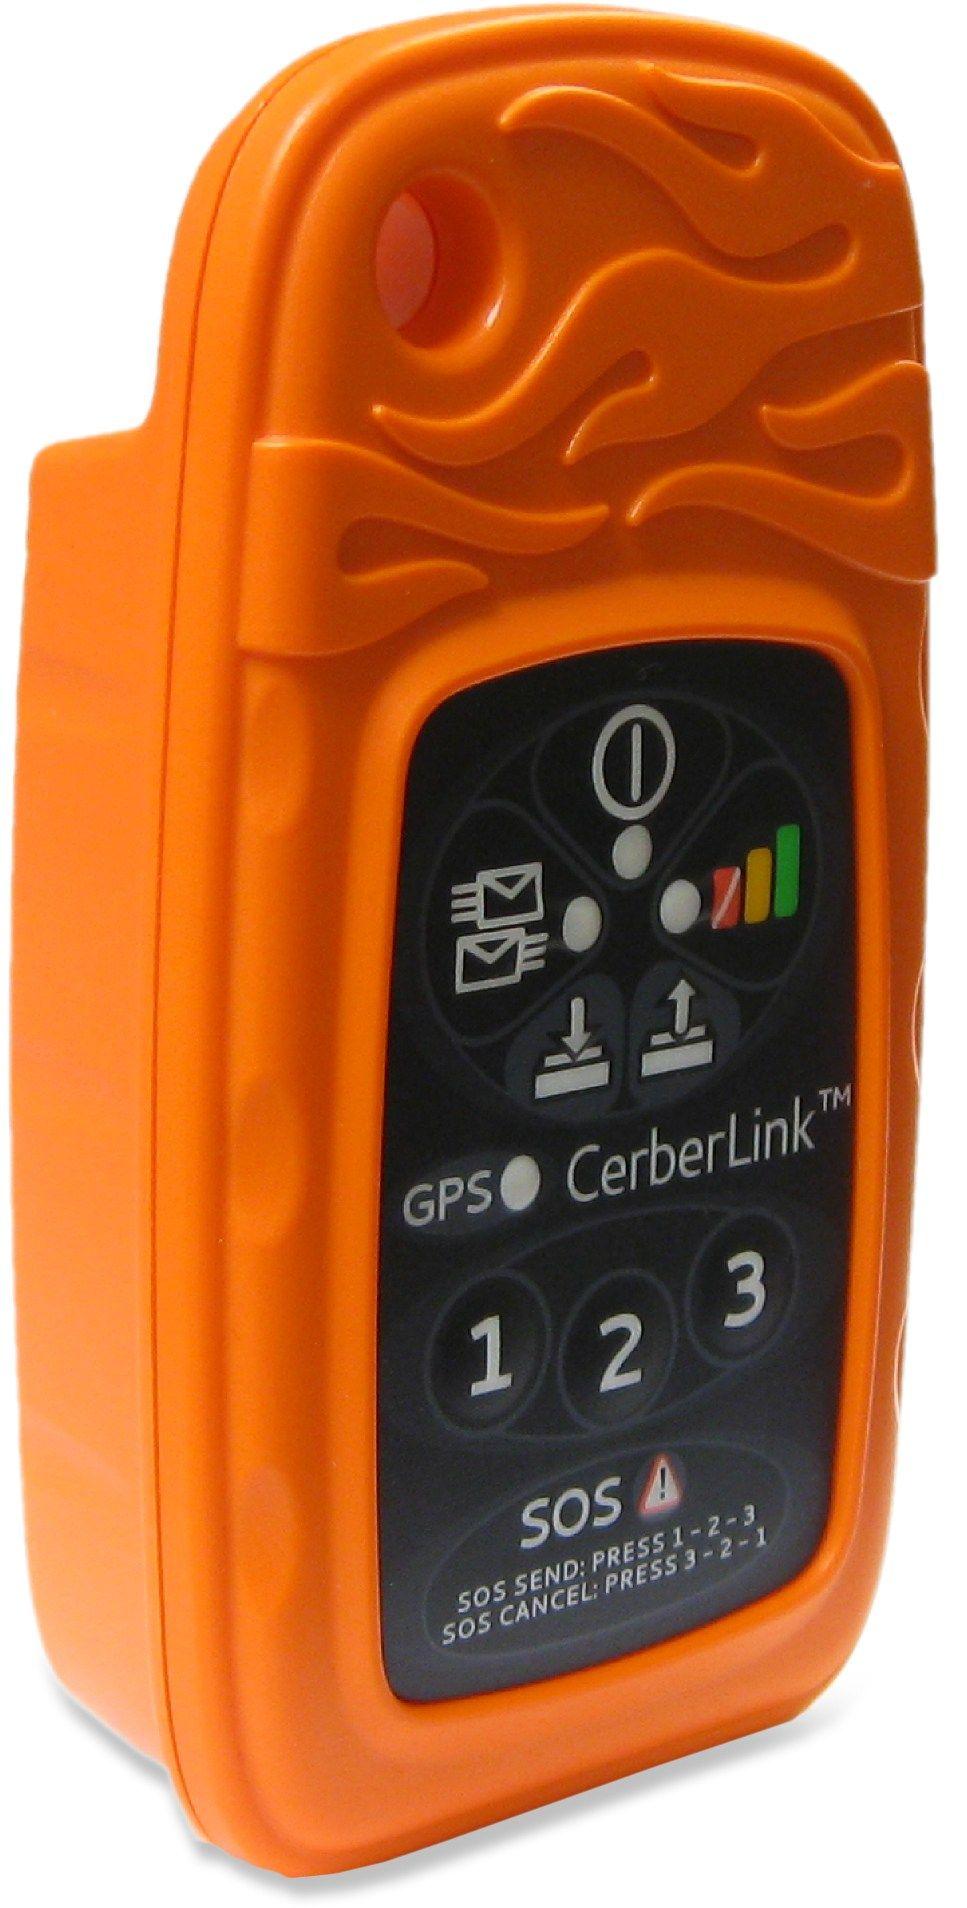 BriarTek Inc Cerberus CerberLink Satellite Messenger for ...